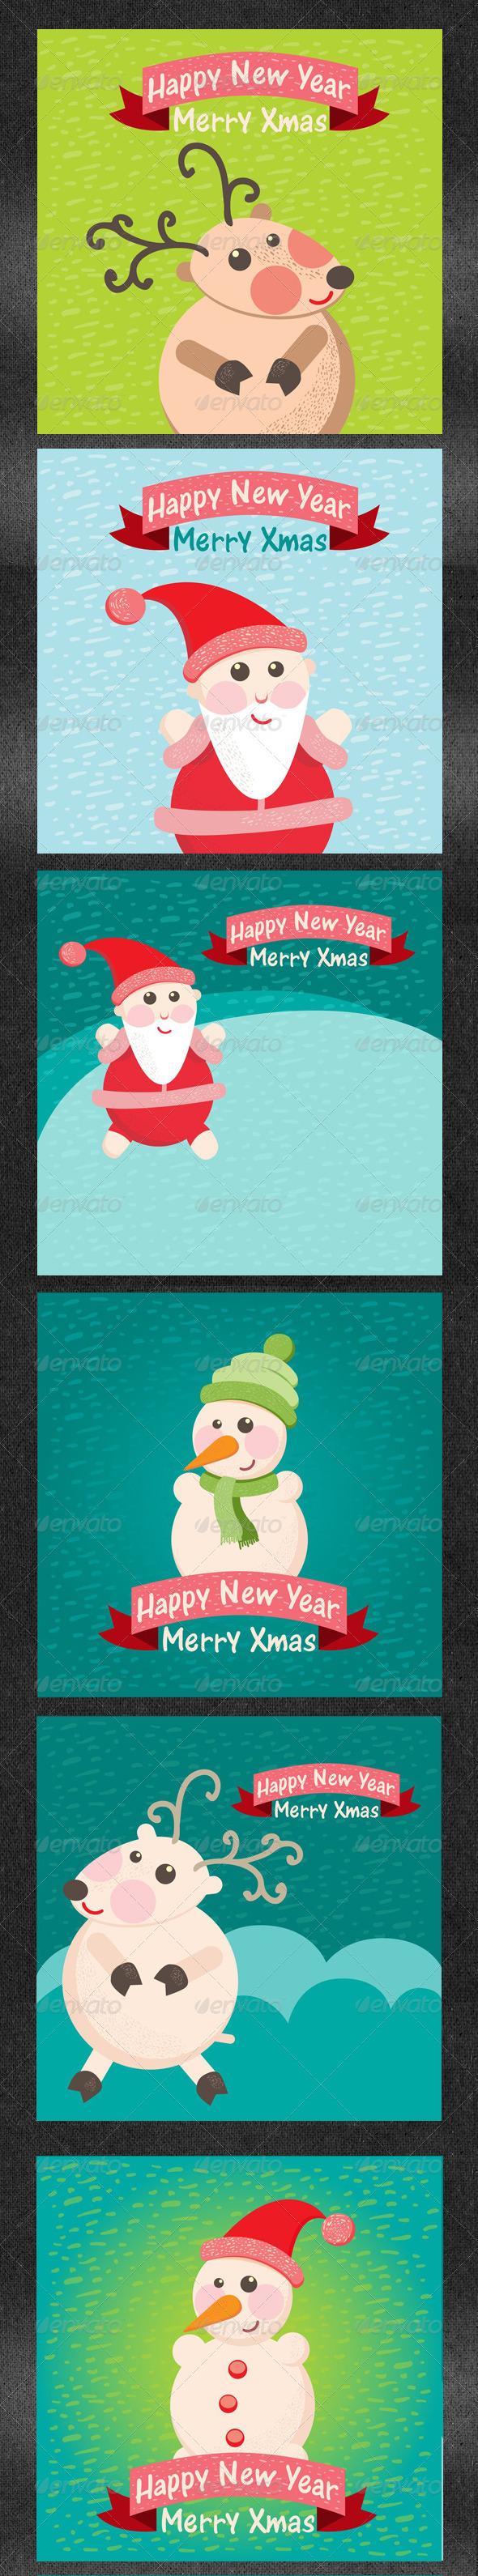 Christmas Greeting Card Part 2